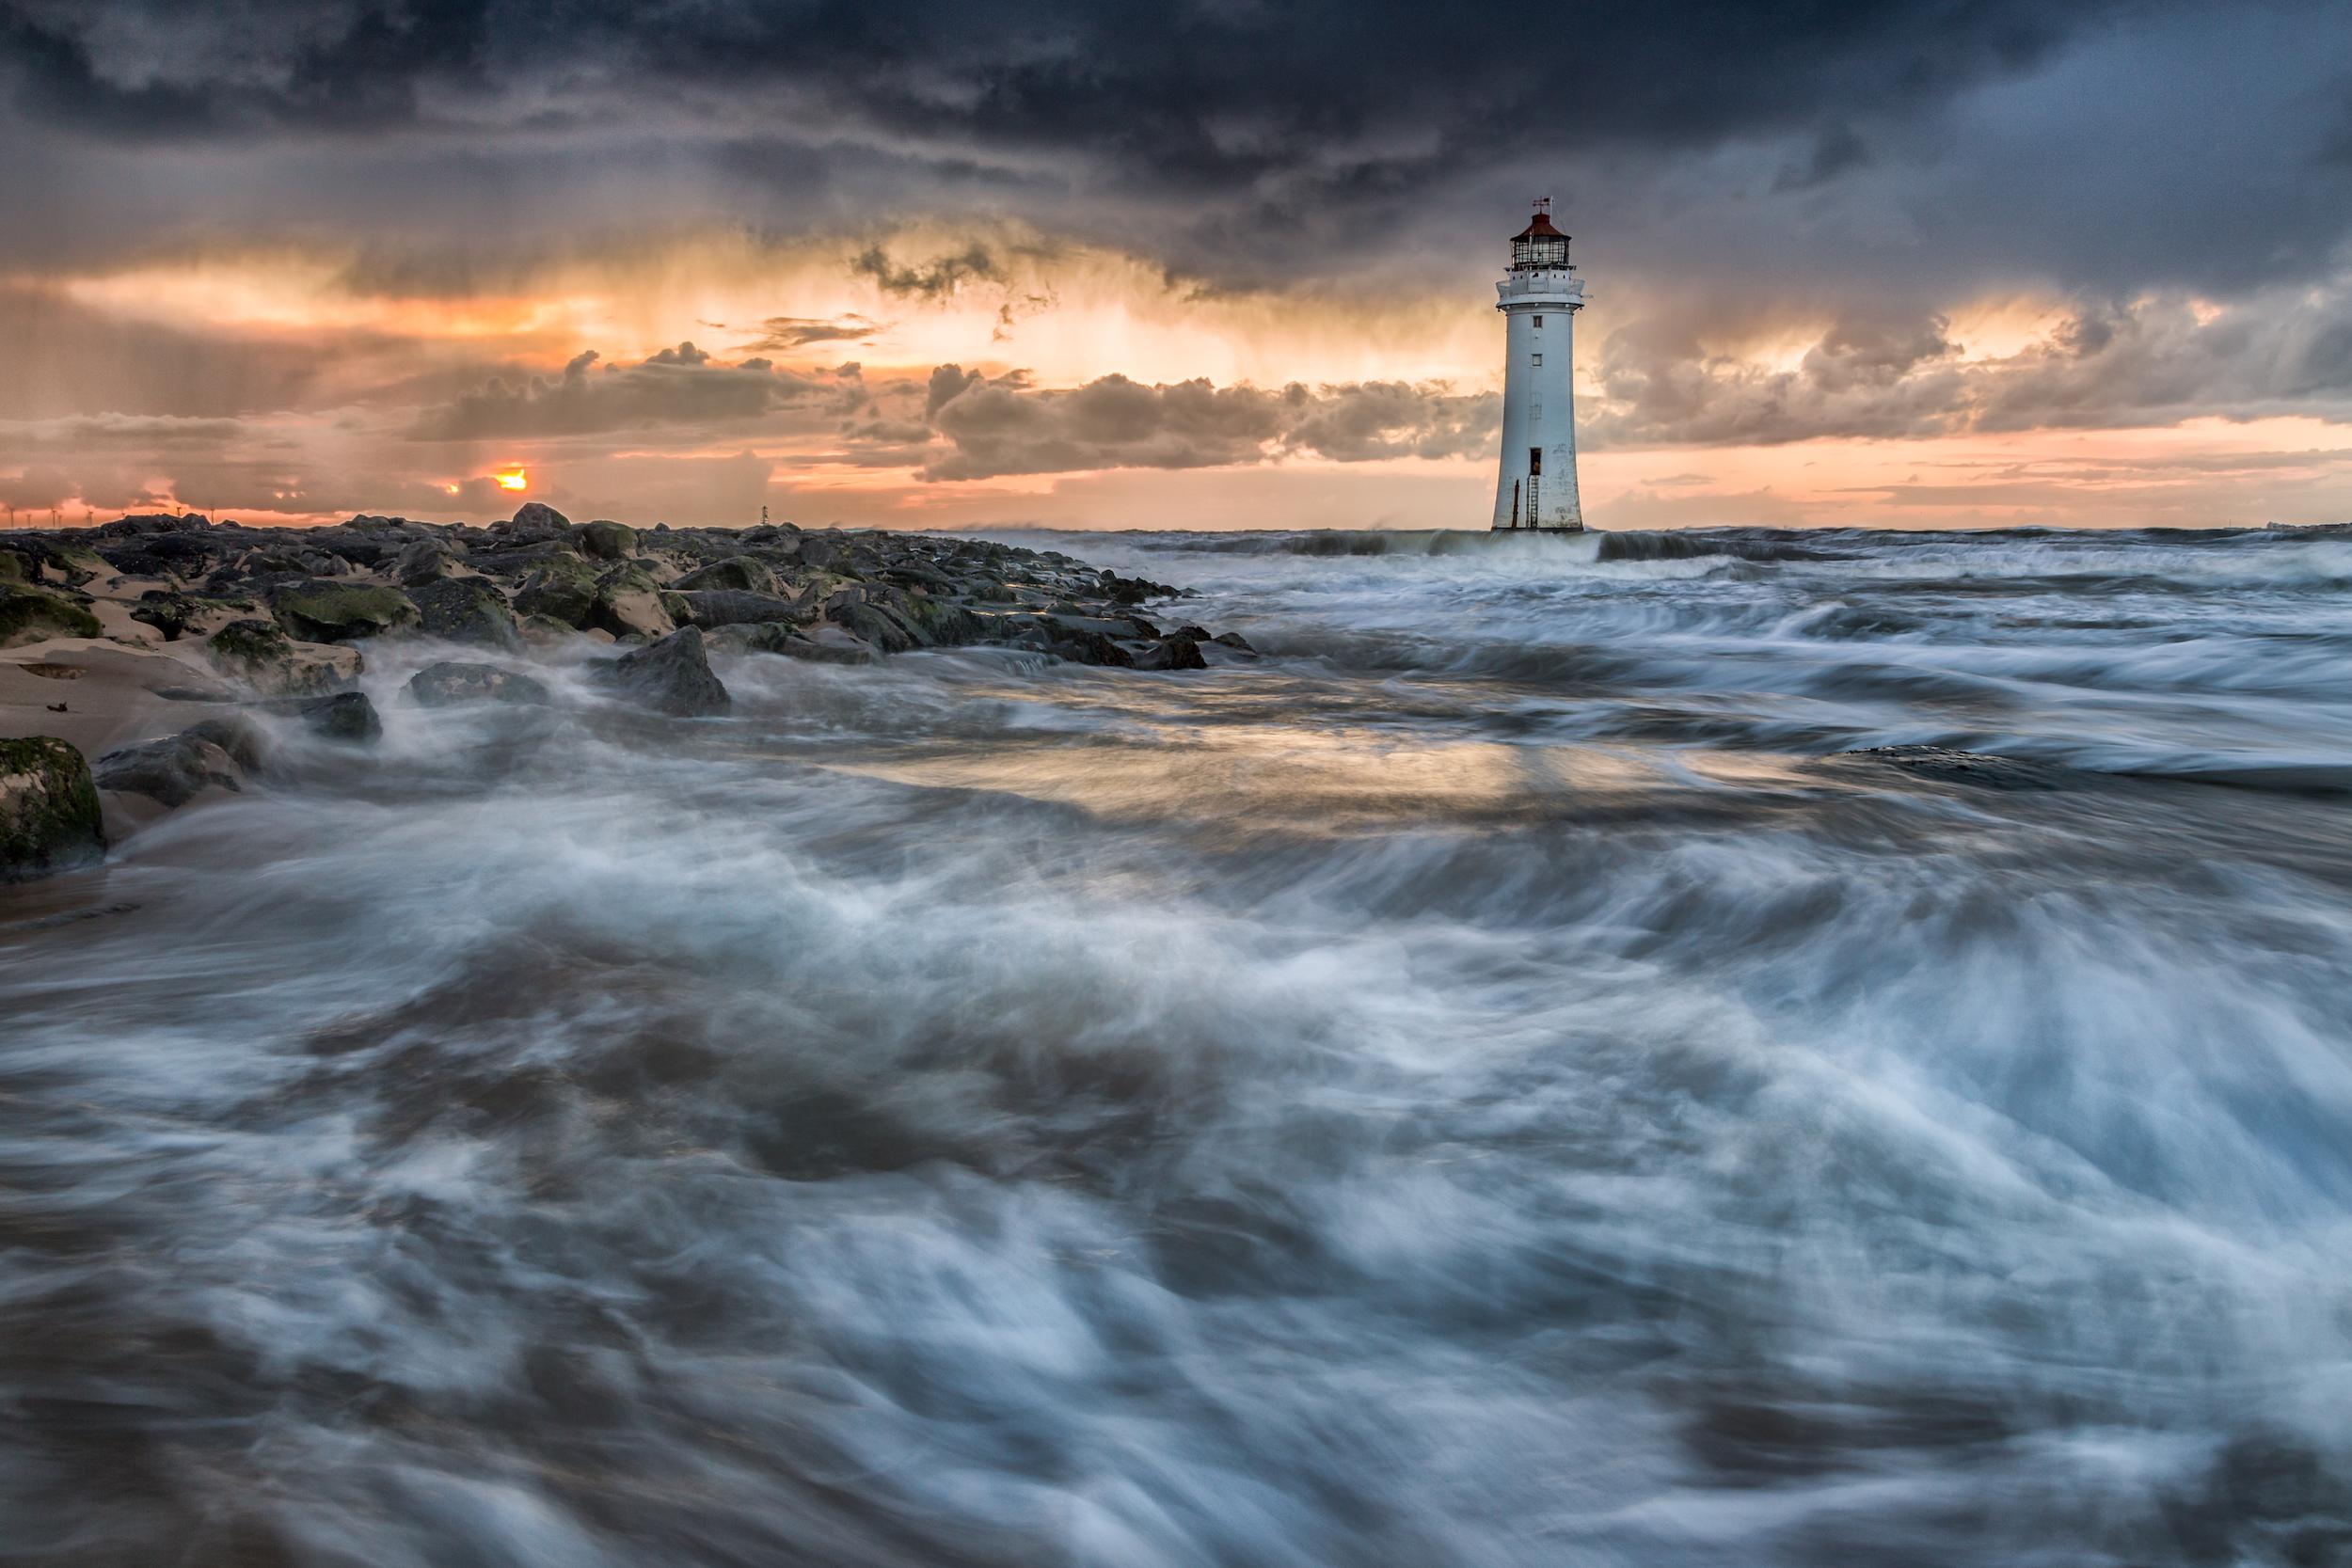 Waves crashing against the shore at New Brighton, England